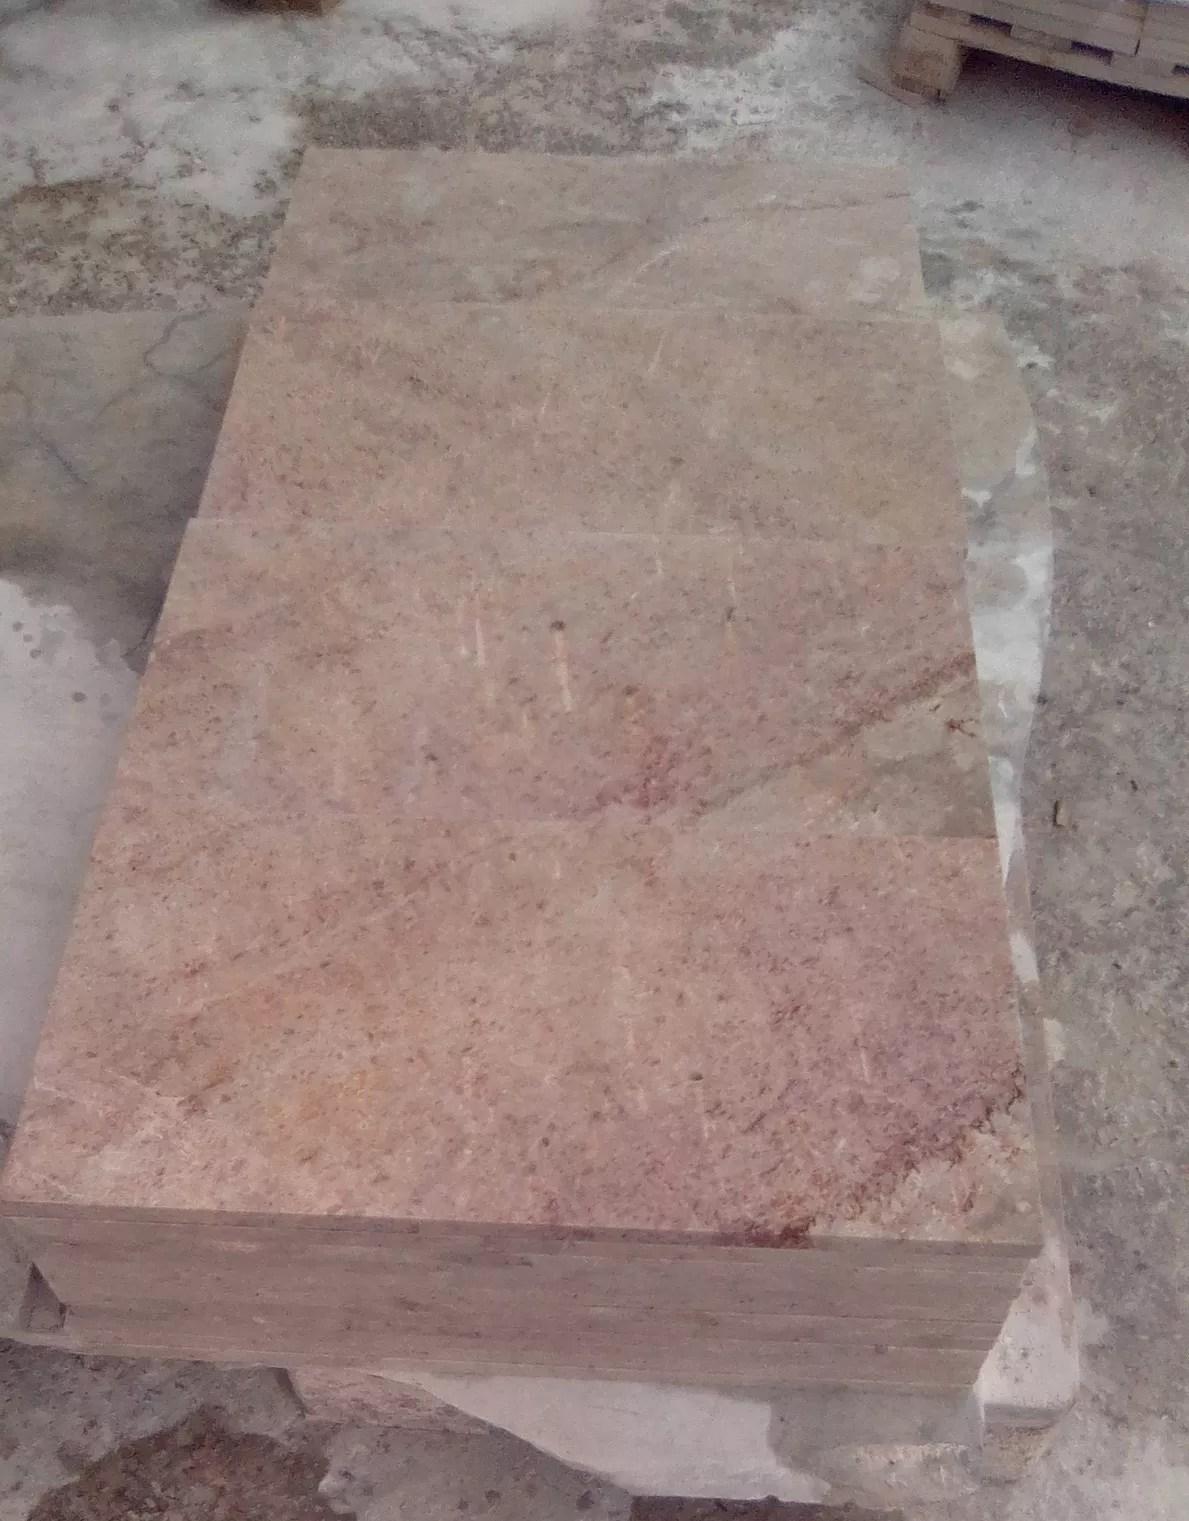 Fabrication D Escalier En Tunisie travertin - rose de kadhel de tunisie - 2 cm - granites & marbres